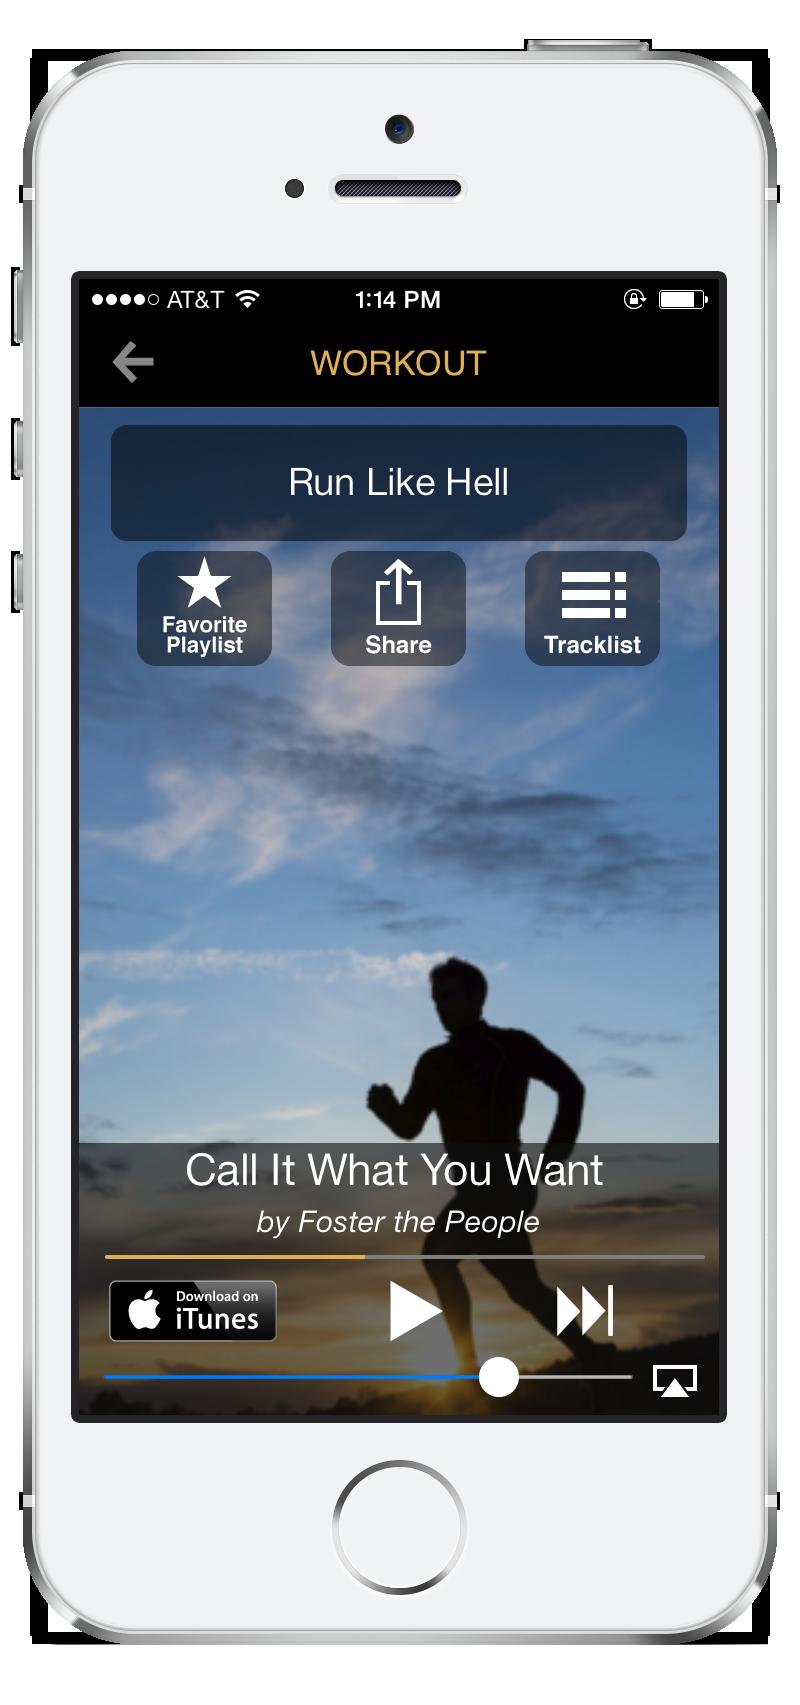 Player - Run Like Hell